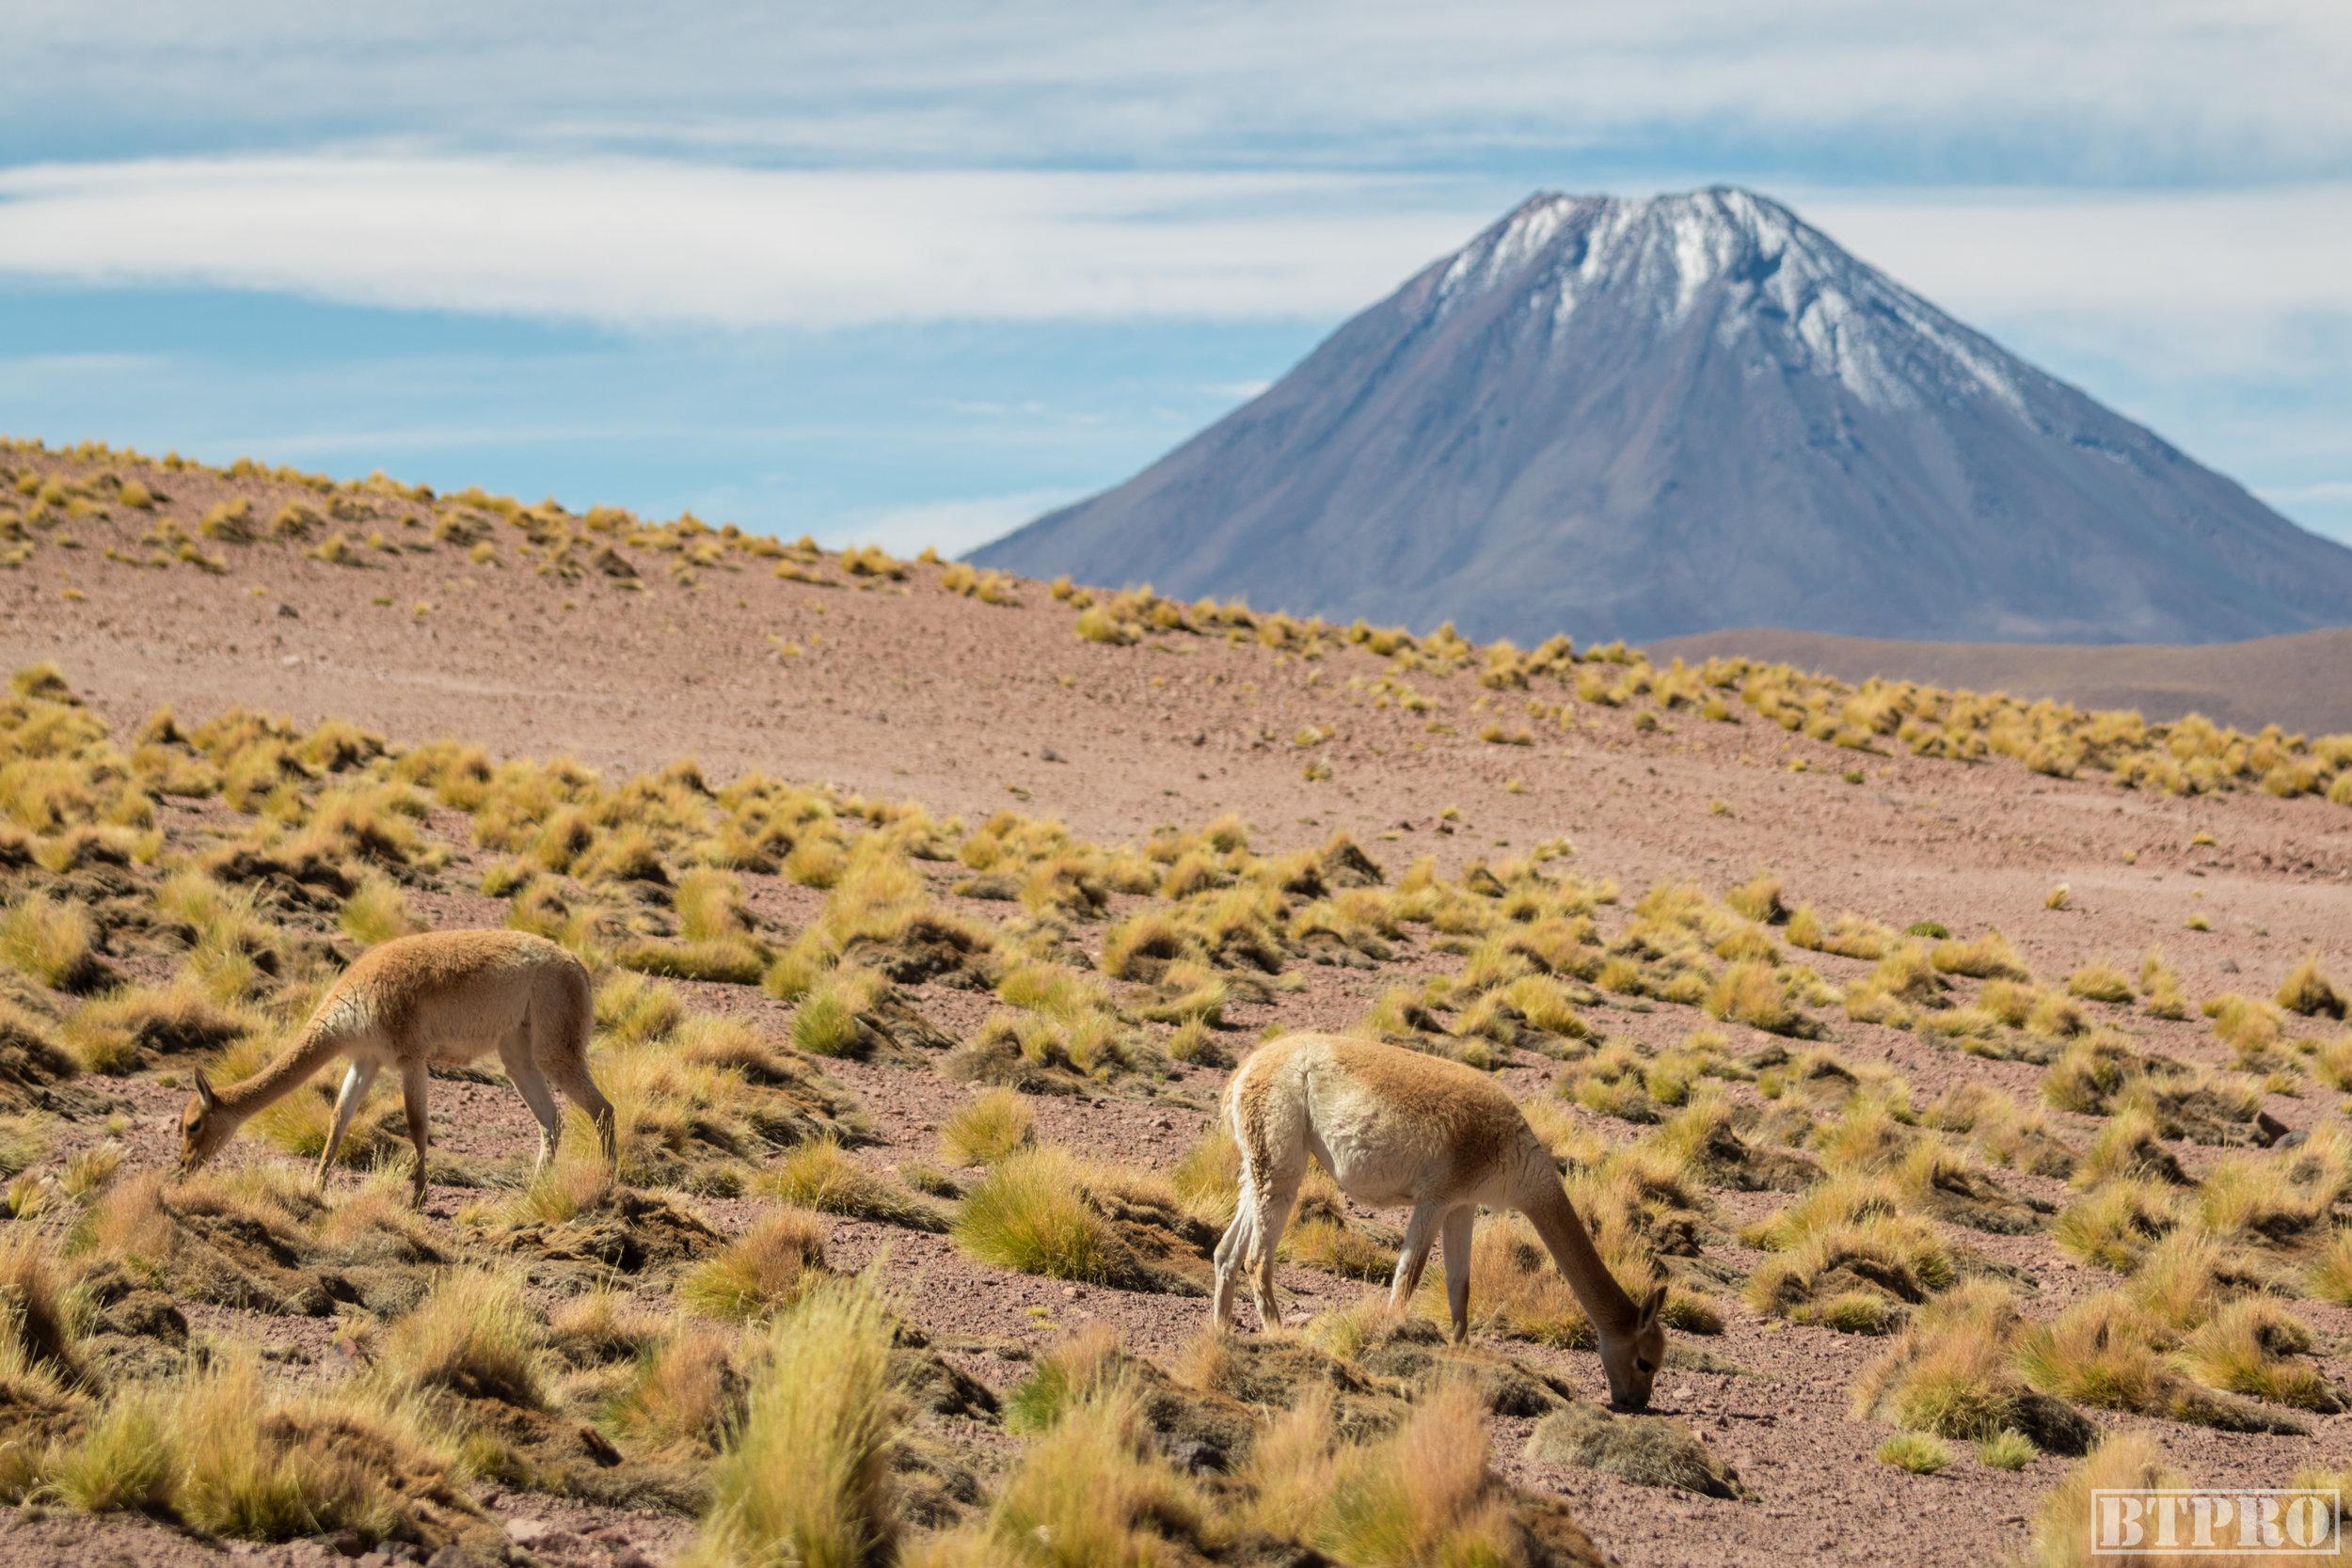 llama, lagoon, chile, nature, nature photography